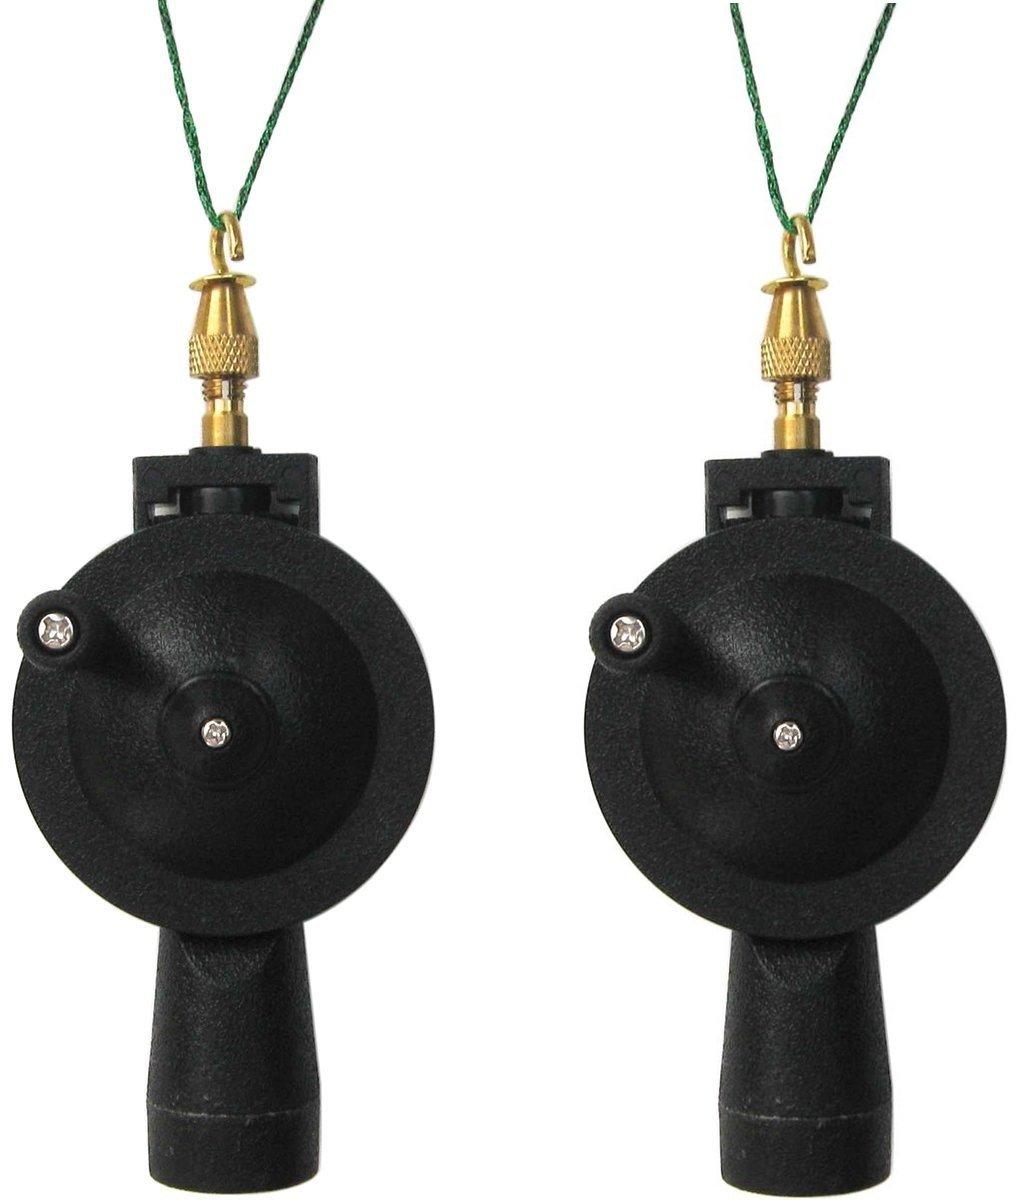 Kreinik AMCDW Beading Tools Custom Corder